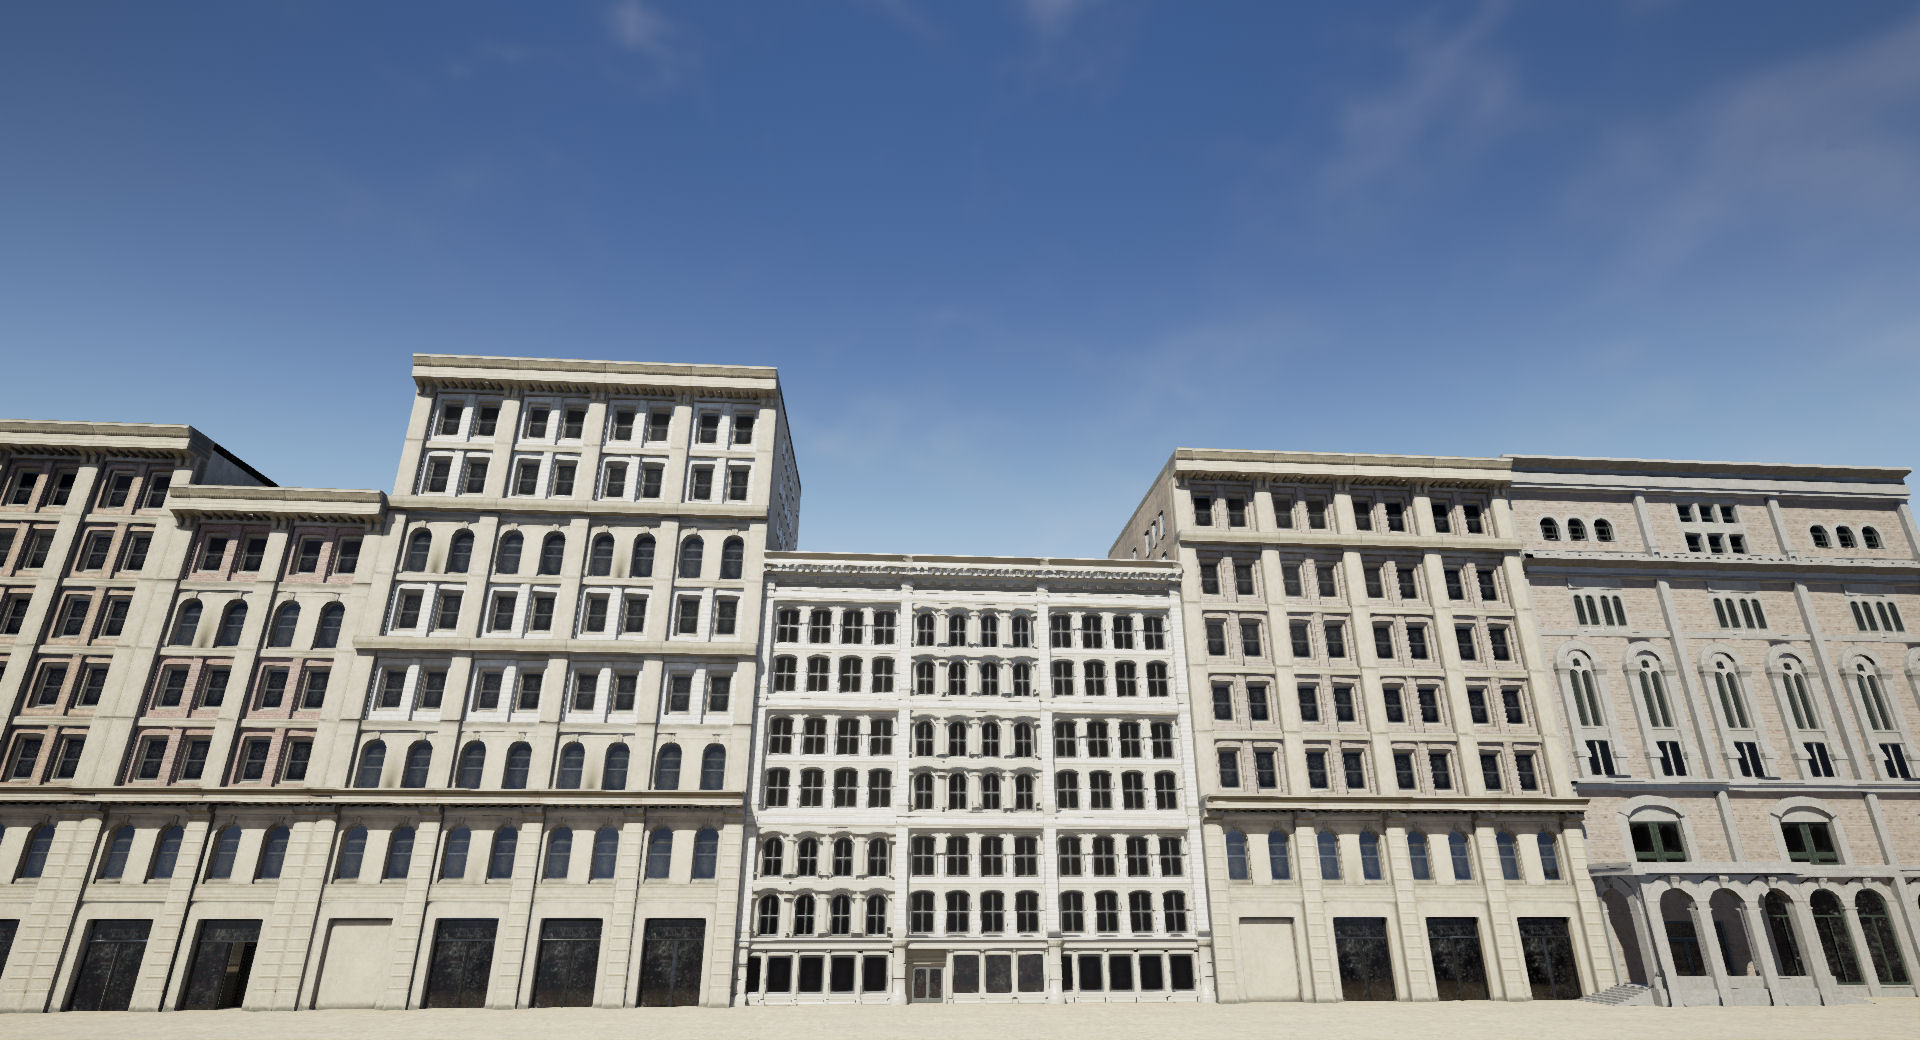 Procedural Building Lot by Ammobox Studios in Blueprints - UE4